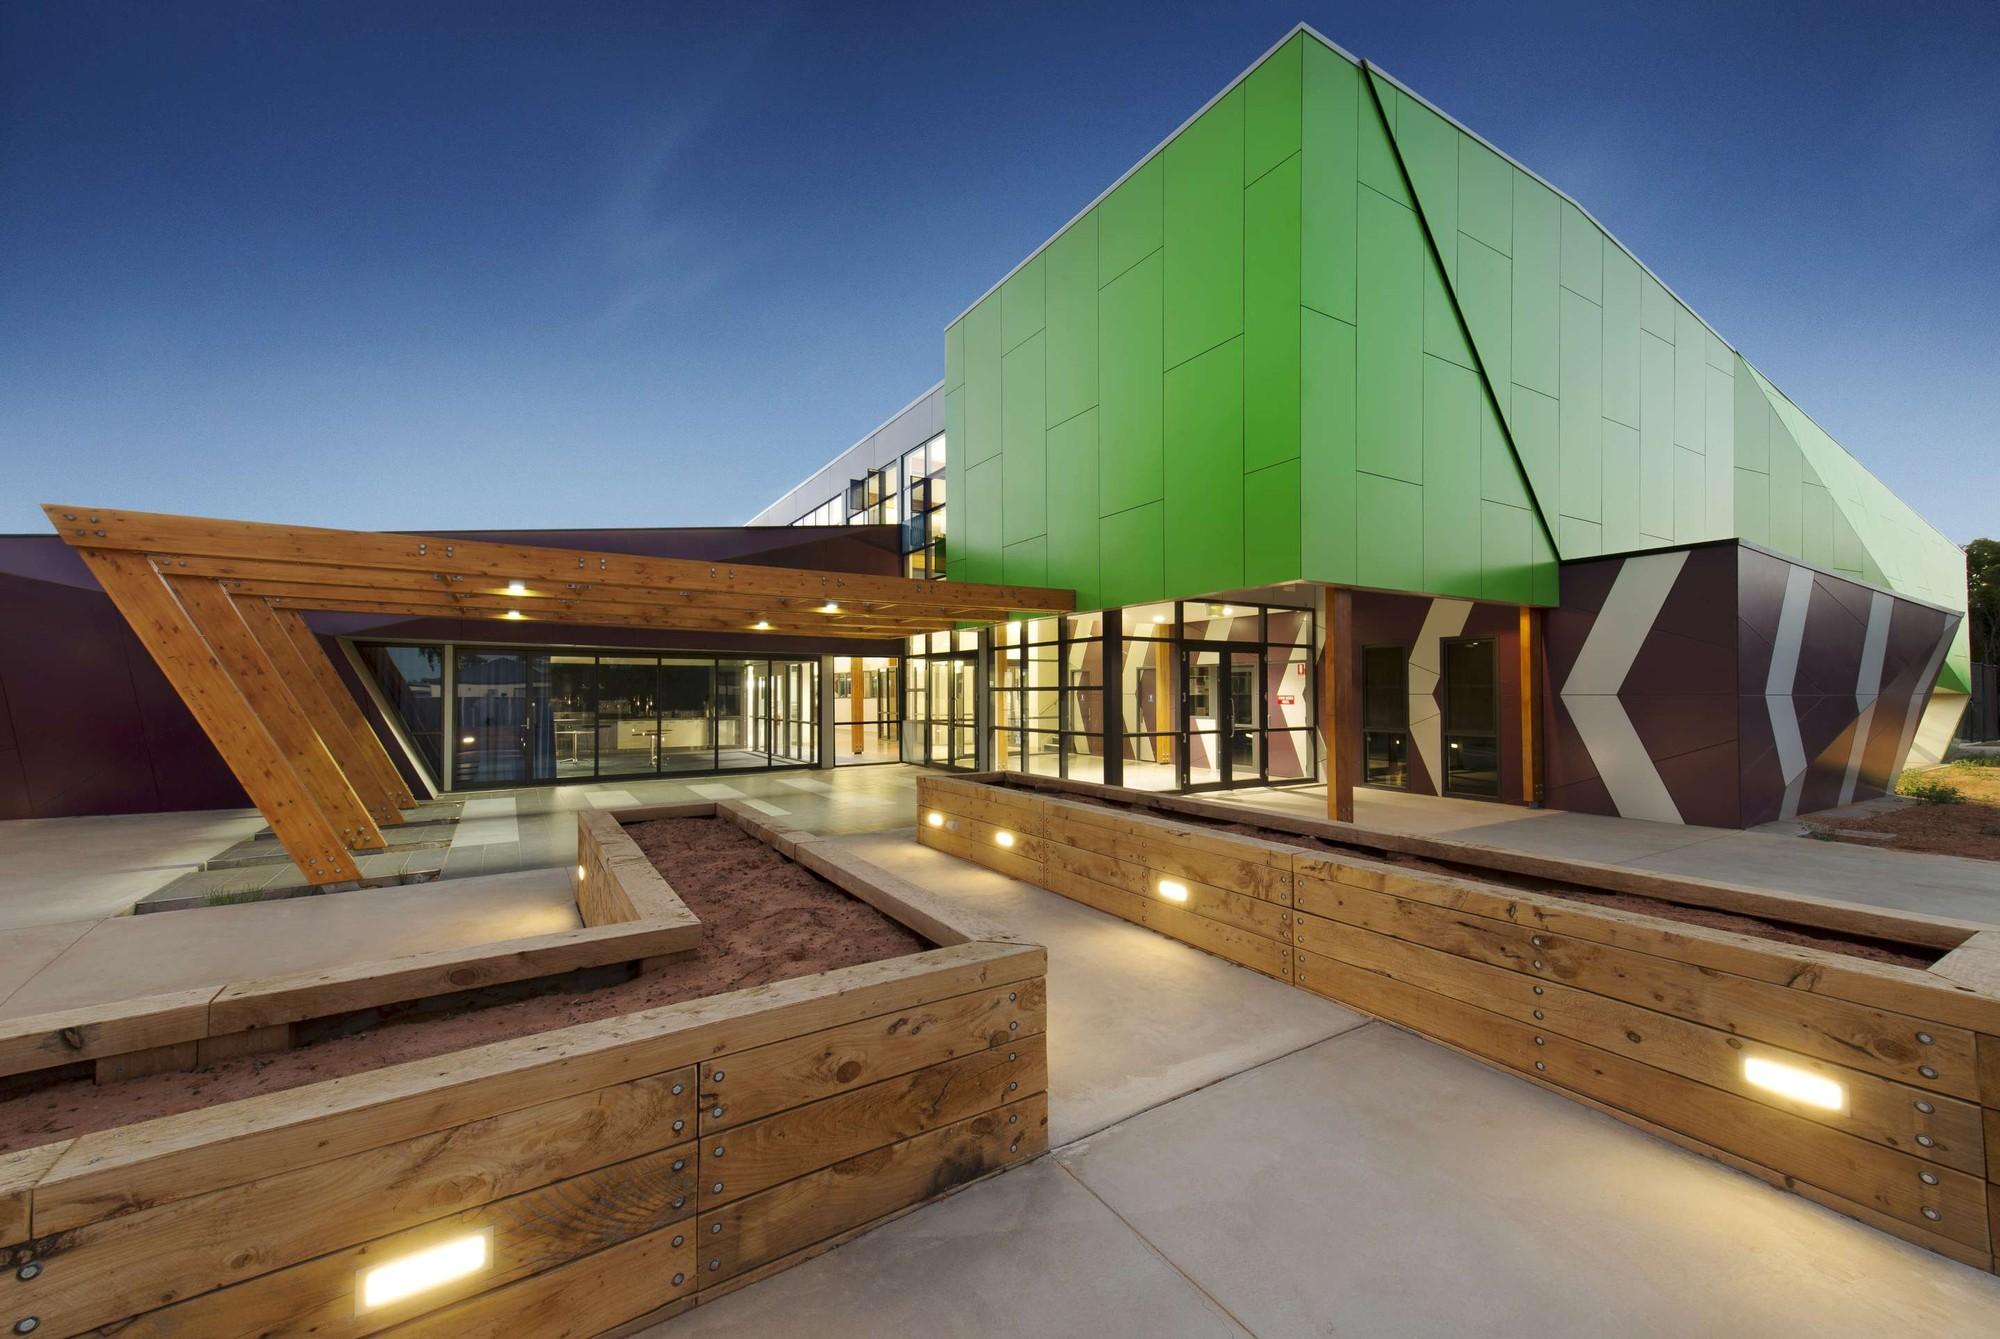 Centro de Treinamento Deakin / Y2 Architecture, © Zachary Couyant